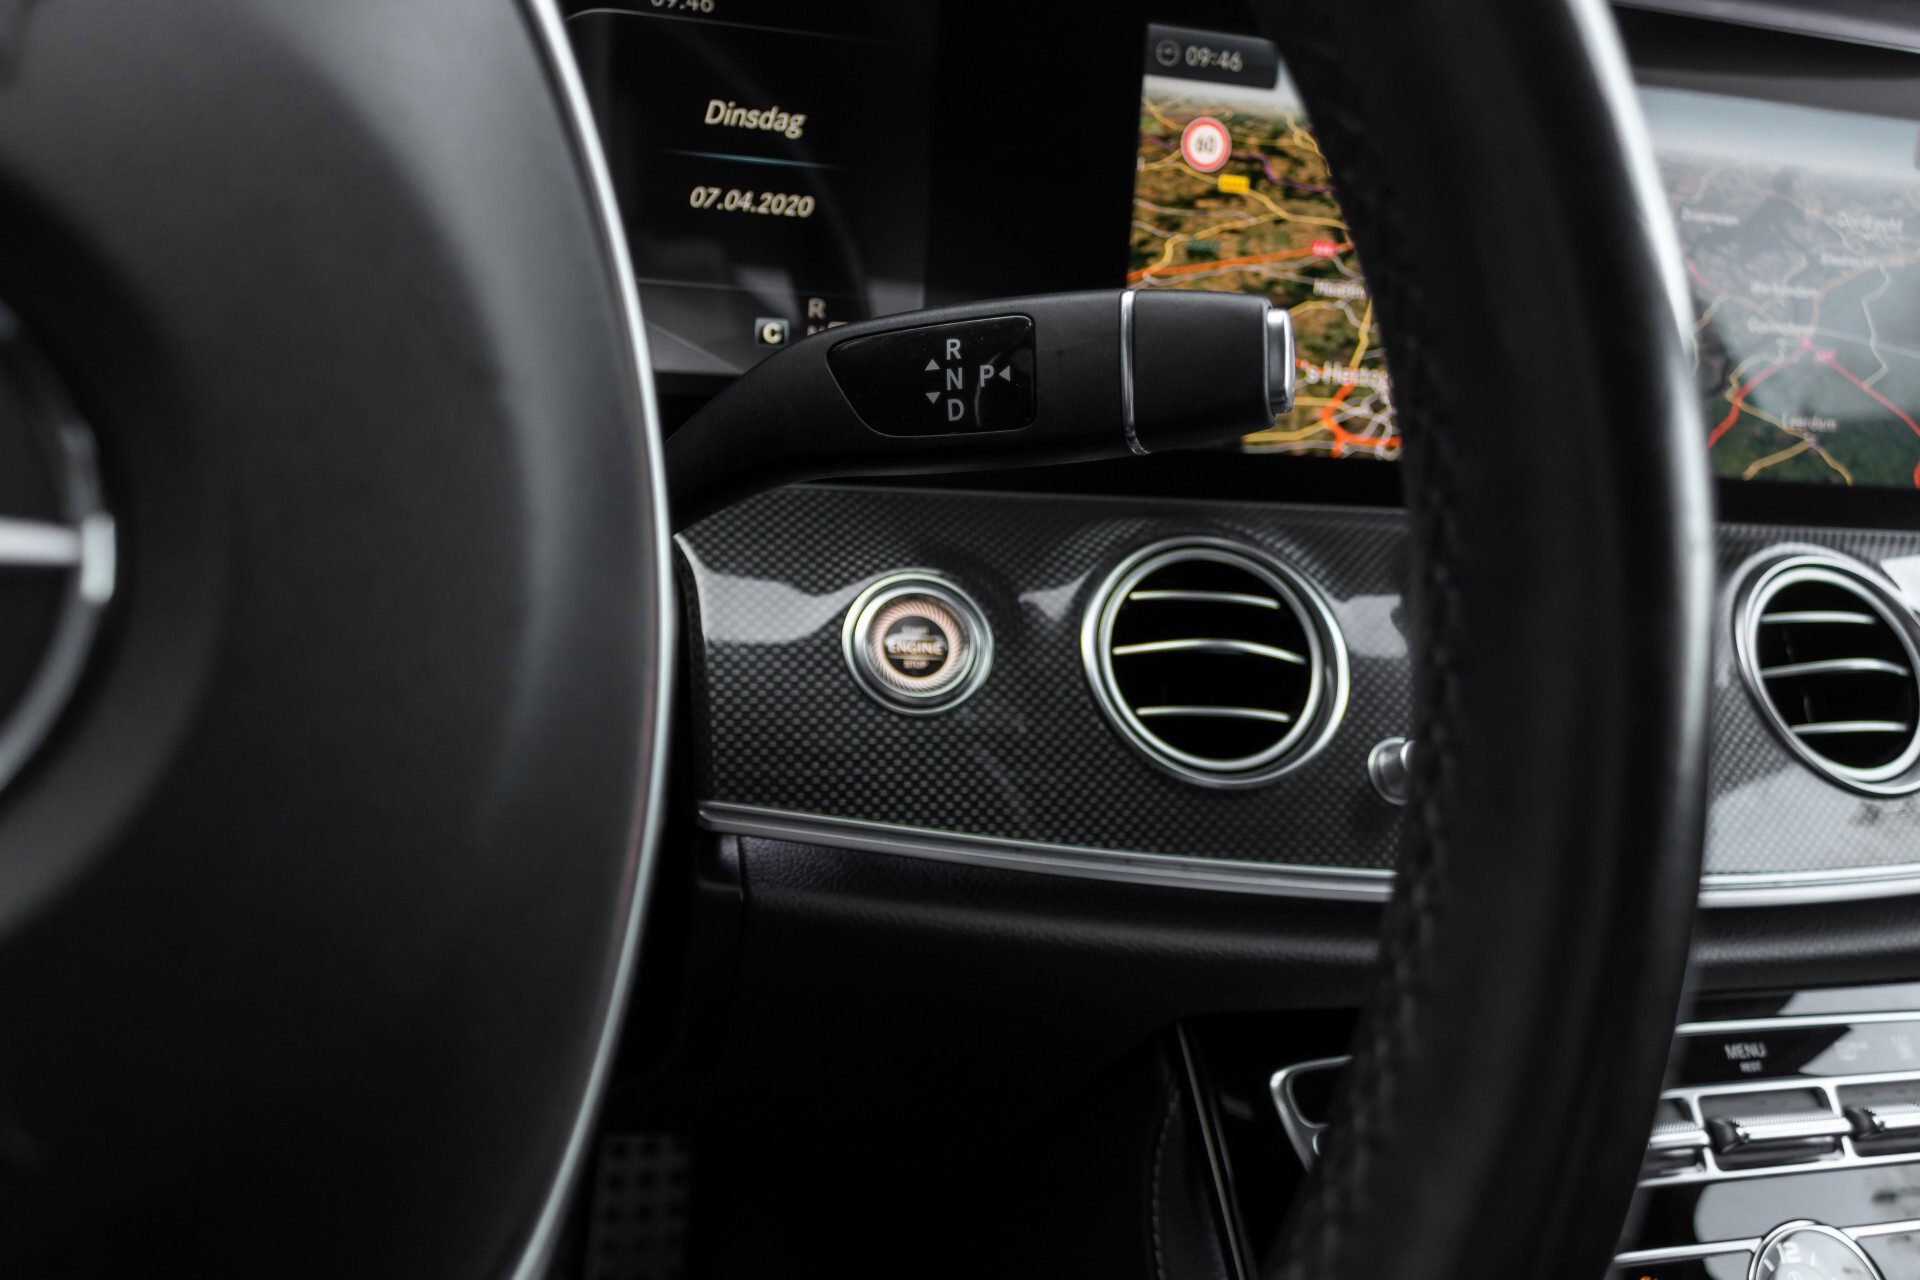 Mercedes-Benz E-Klasse 220 d AMG Night Distronic/Widescreen/Burmester/Schuifdak/Standkachel Aut9 Foto 13